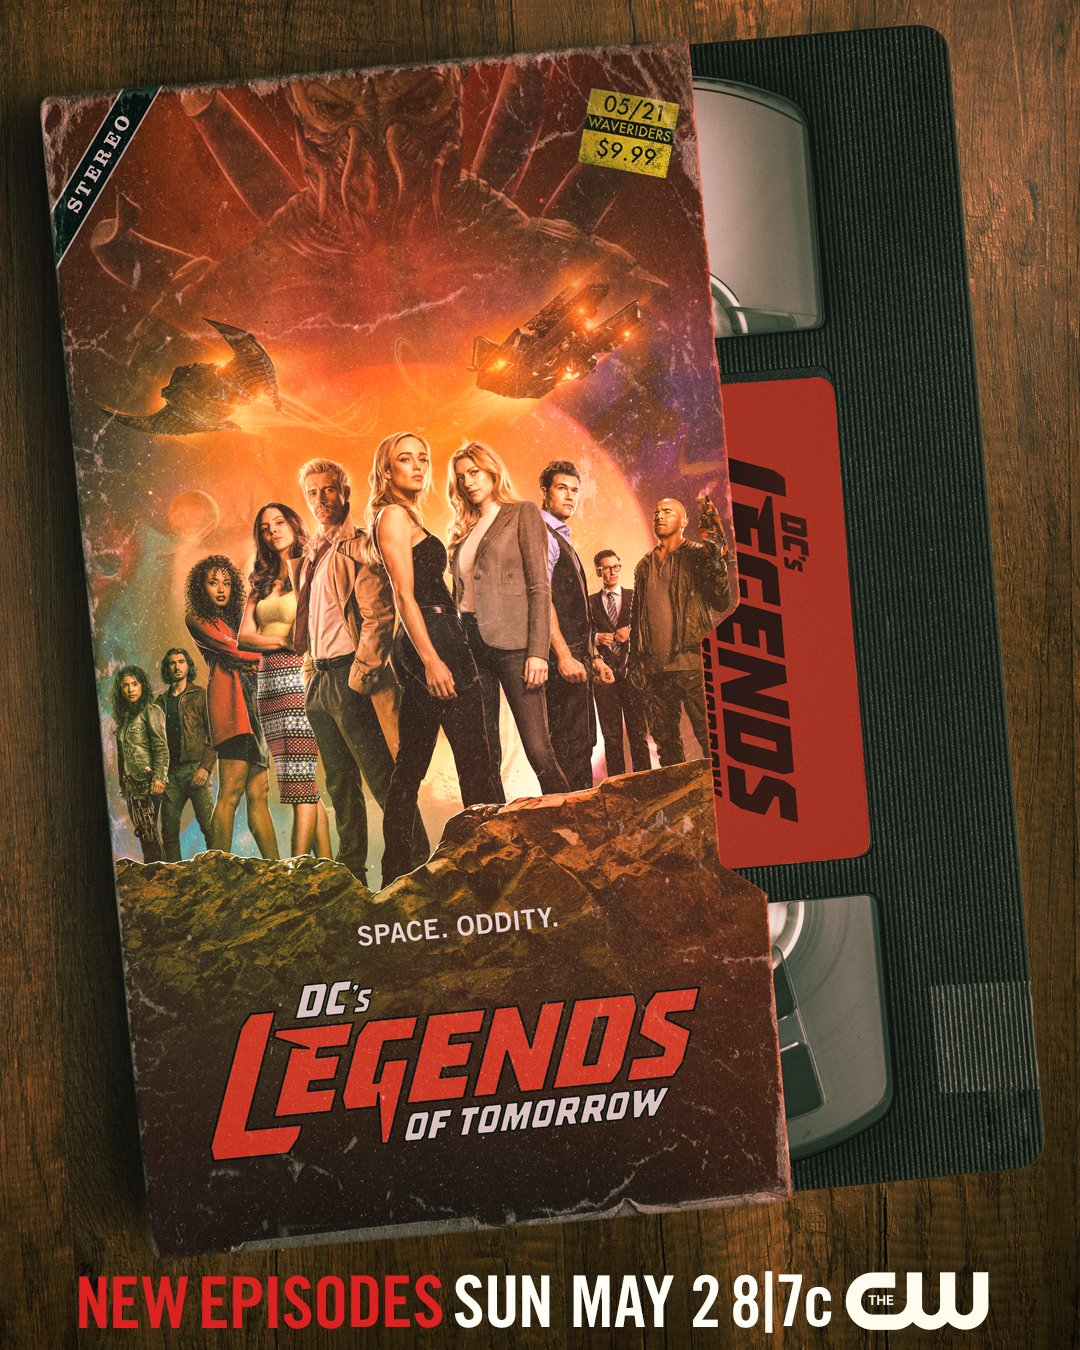 Póster de la temporada 6 de DC's Legends of Tomorrow. Imagen: DC's Legends of Tomorrow Twitter (@TheCW_Legends).